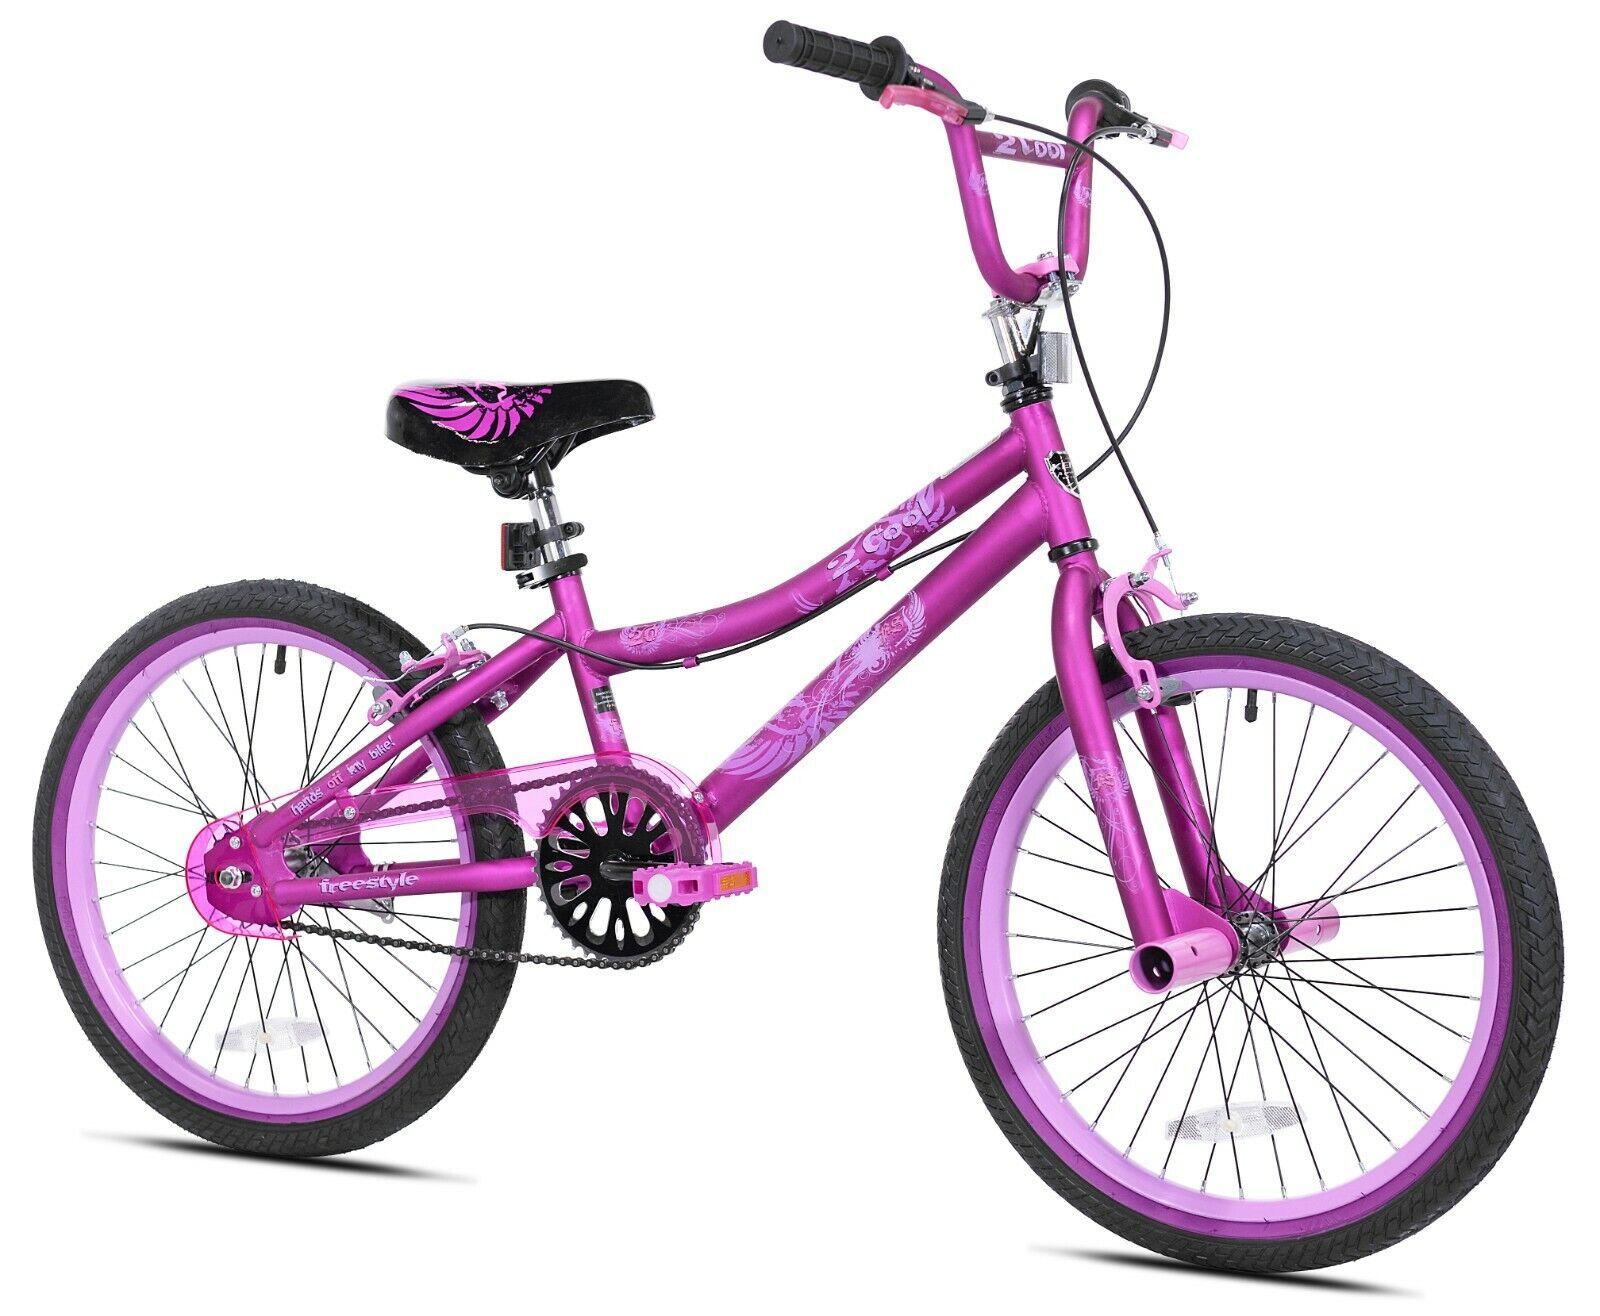 Kent 32001 20 Inch Bmx Bike Purple For Sale Online Ebay